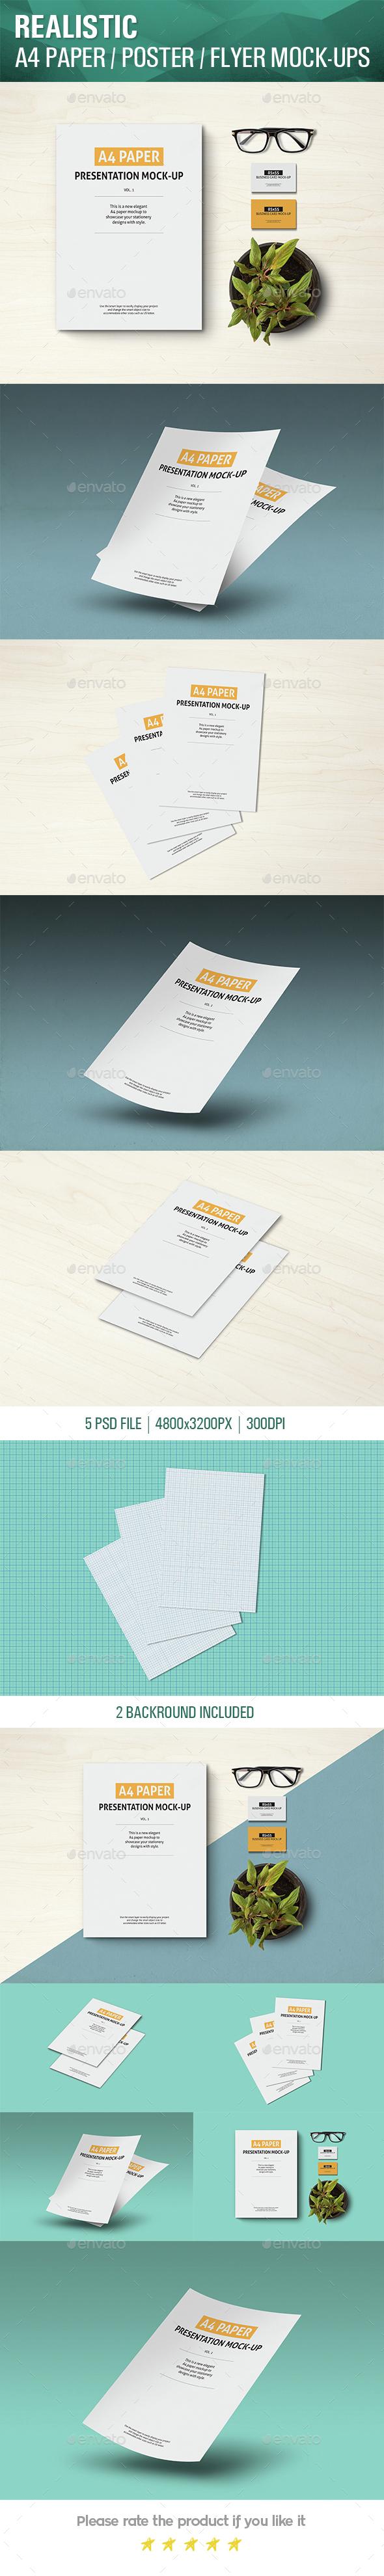 A4 Paper / Poster / Flyer Mockup - Flyers Print